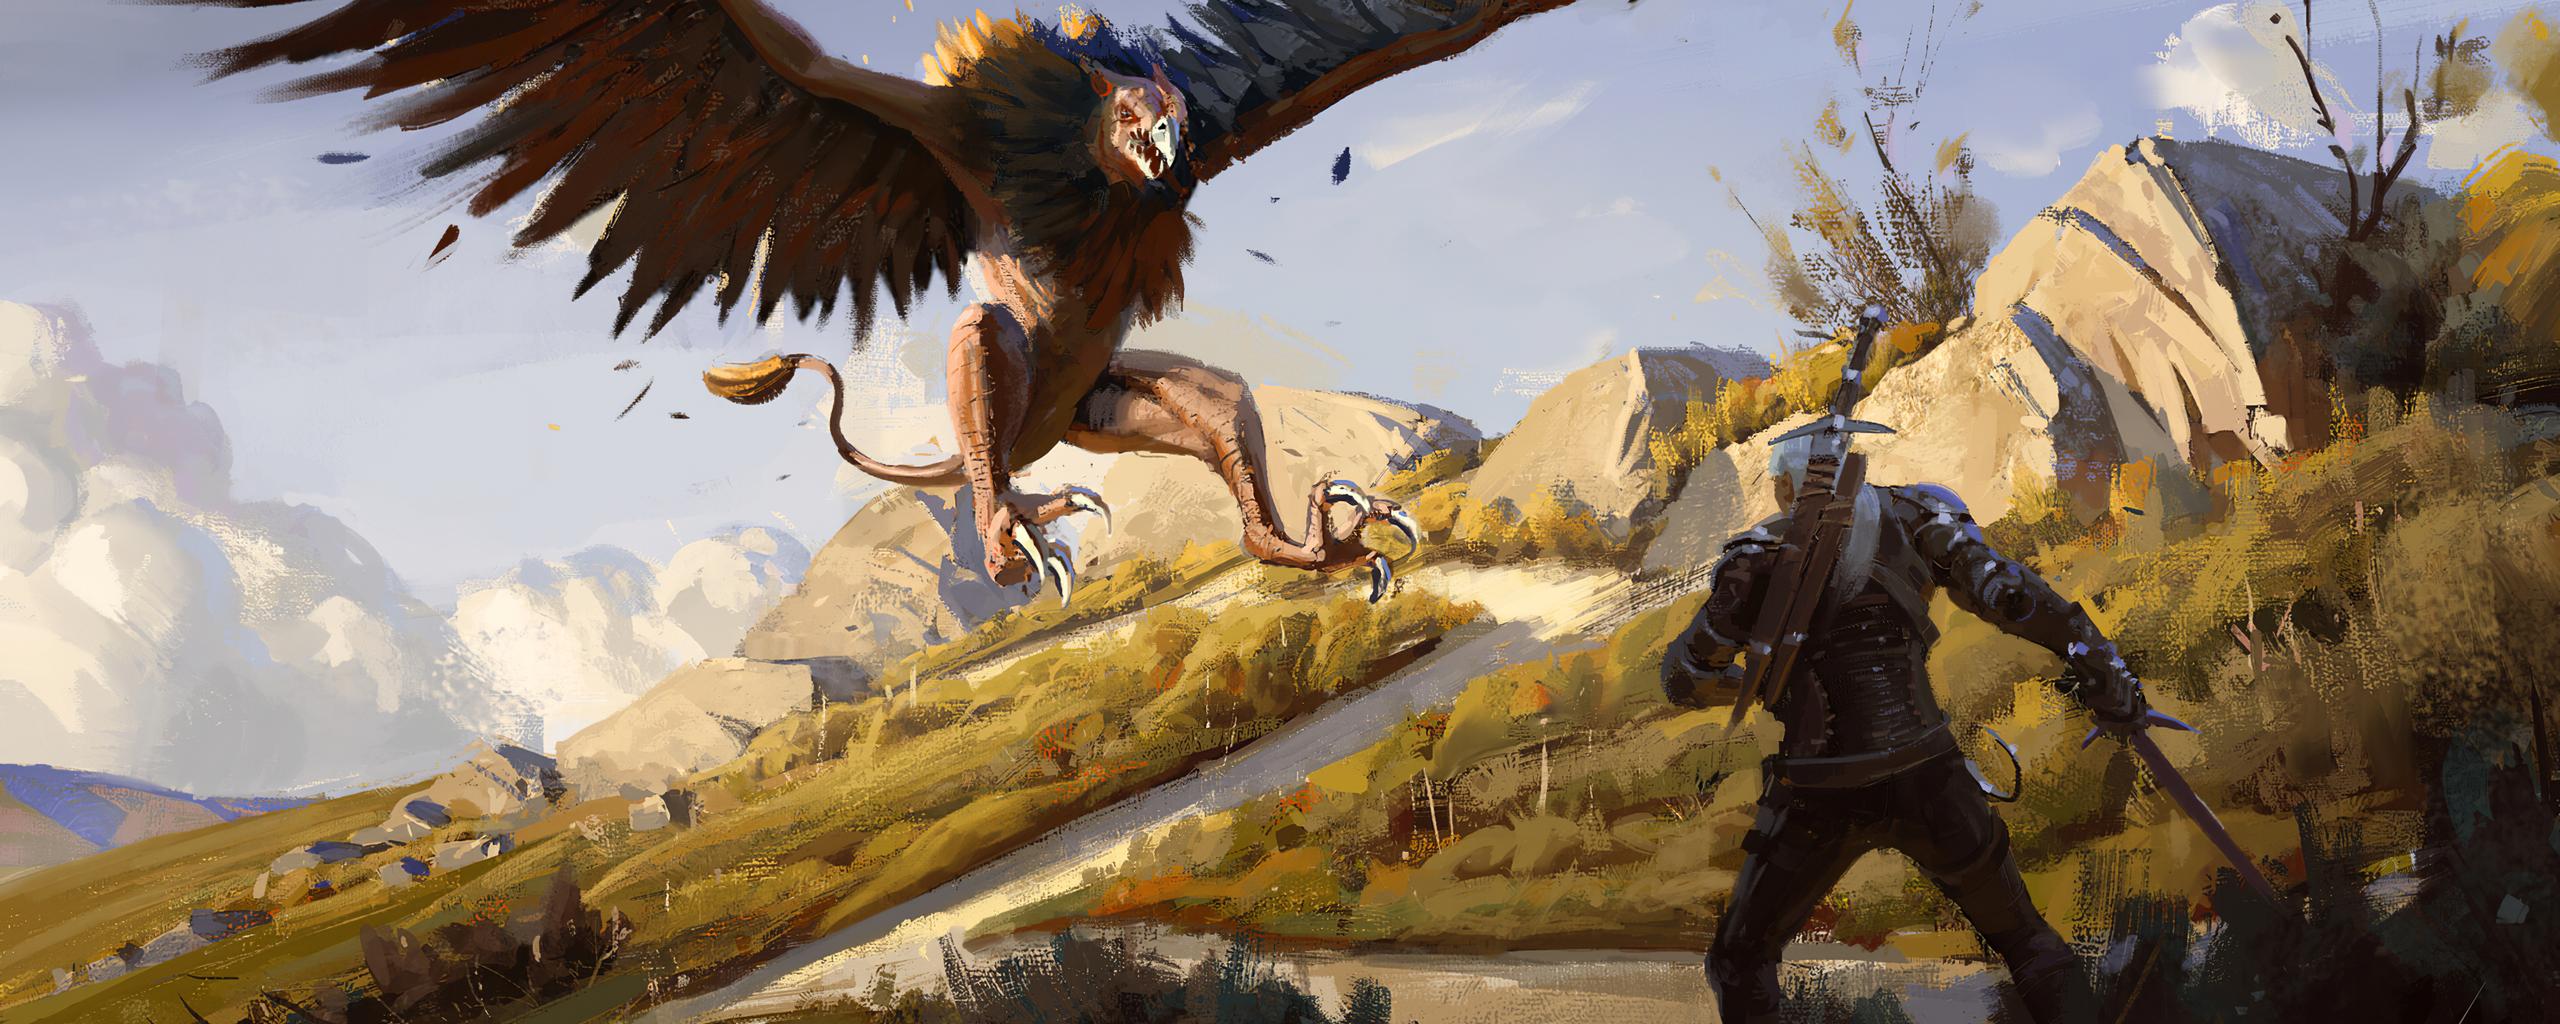 the-witcher-vs-eagle-g8.jpg